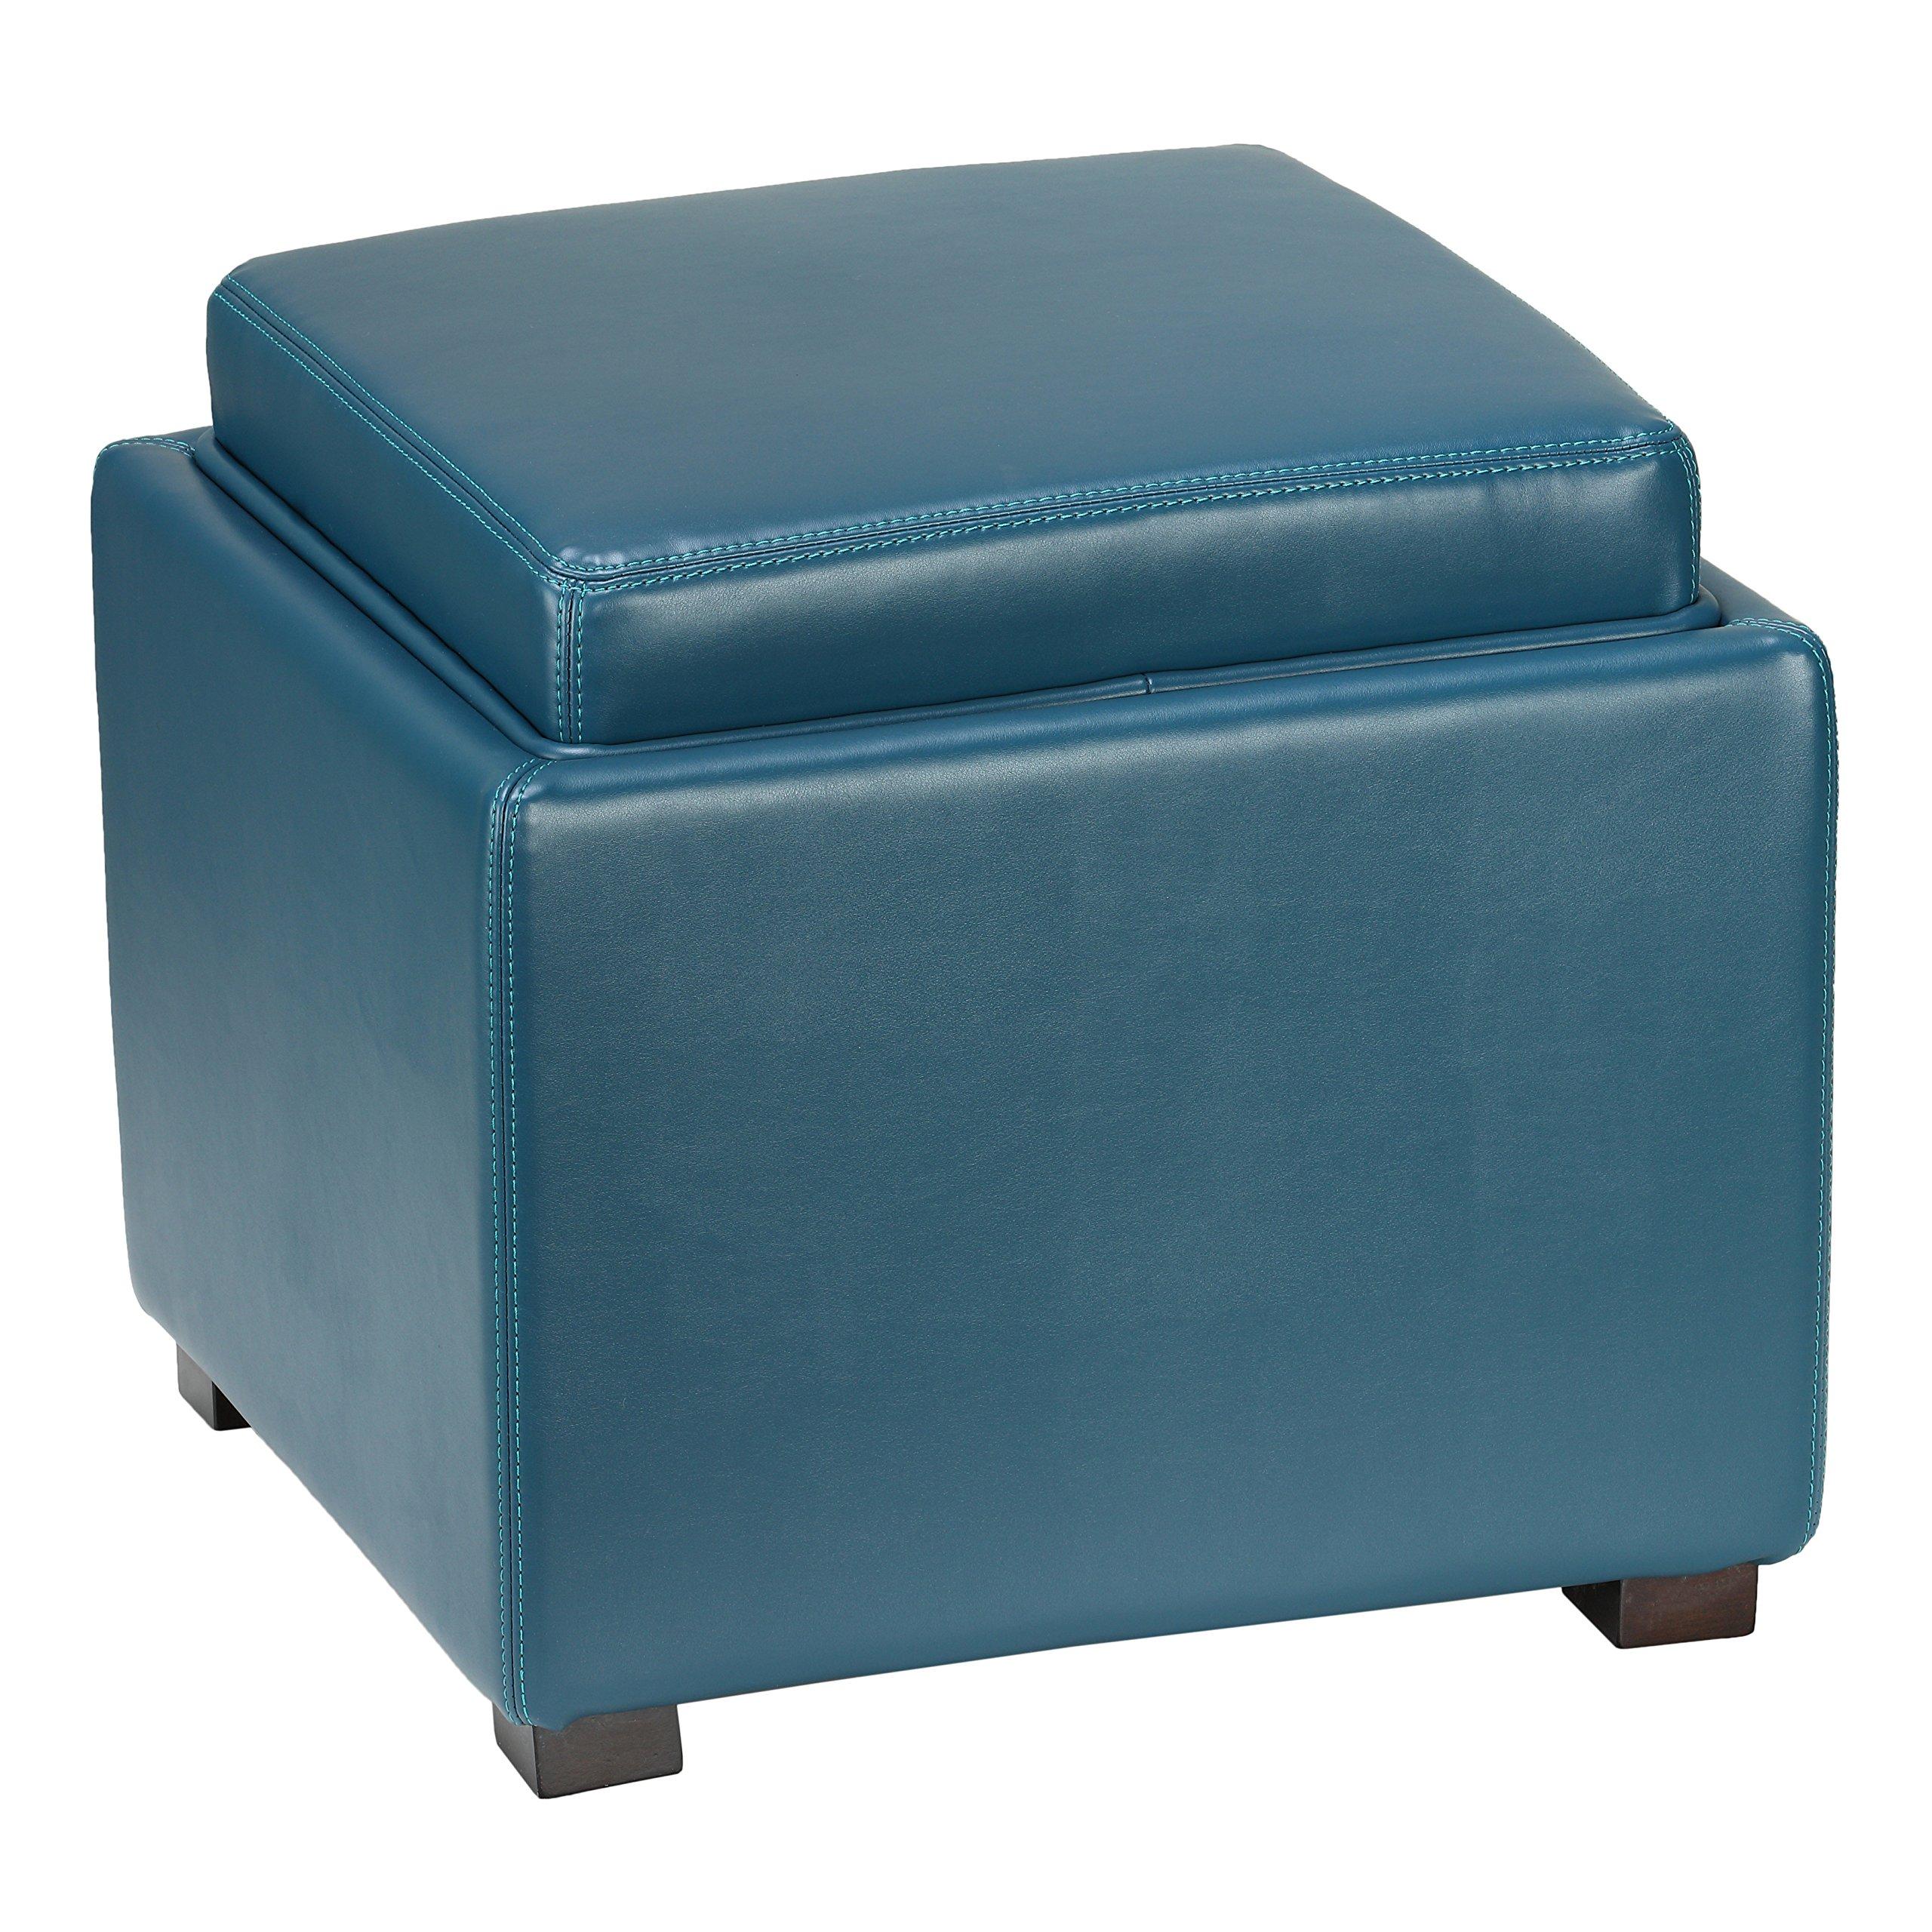 Cortesi Home Mavi Storage Tray Ottoman in Bonded Leather, Deep Turquoise Blue